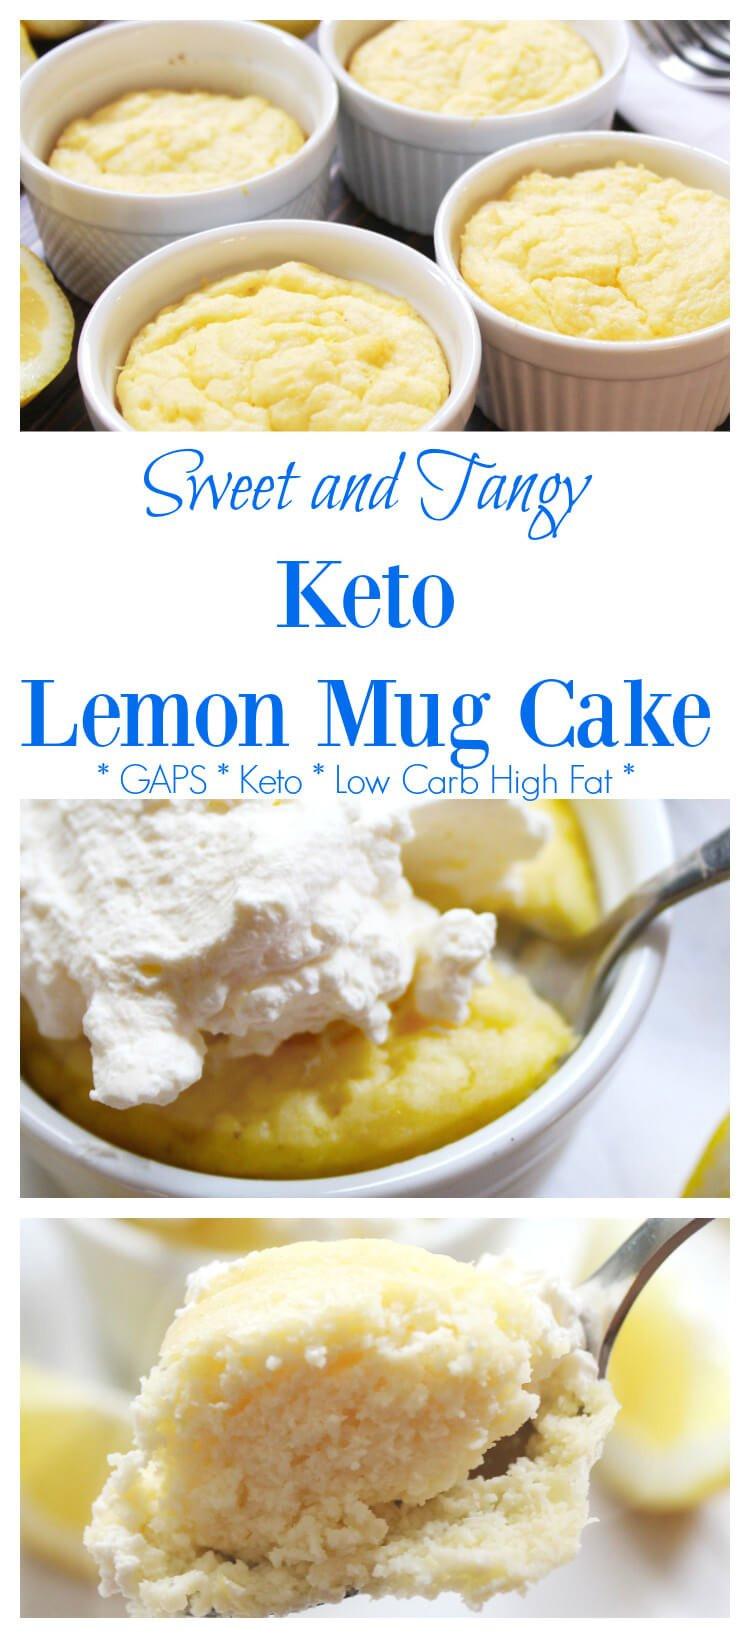 Dairy Free Keto Recipes  Keto Lemon Mug Cake Recipe GAPS & Dairy Free Option